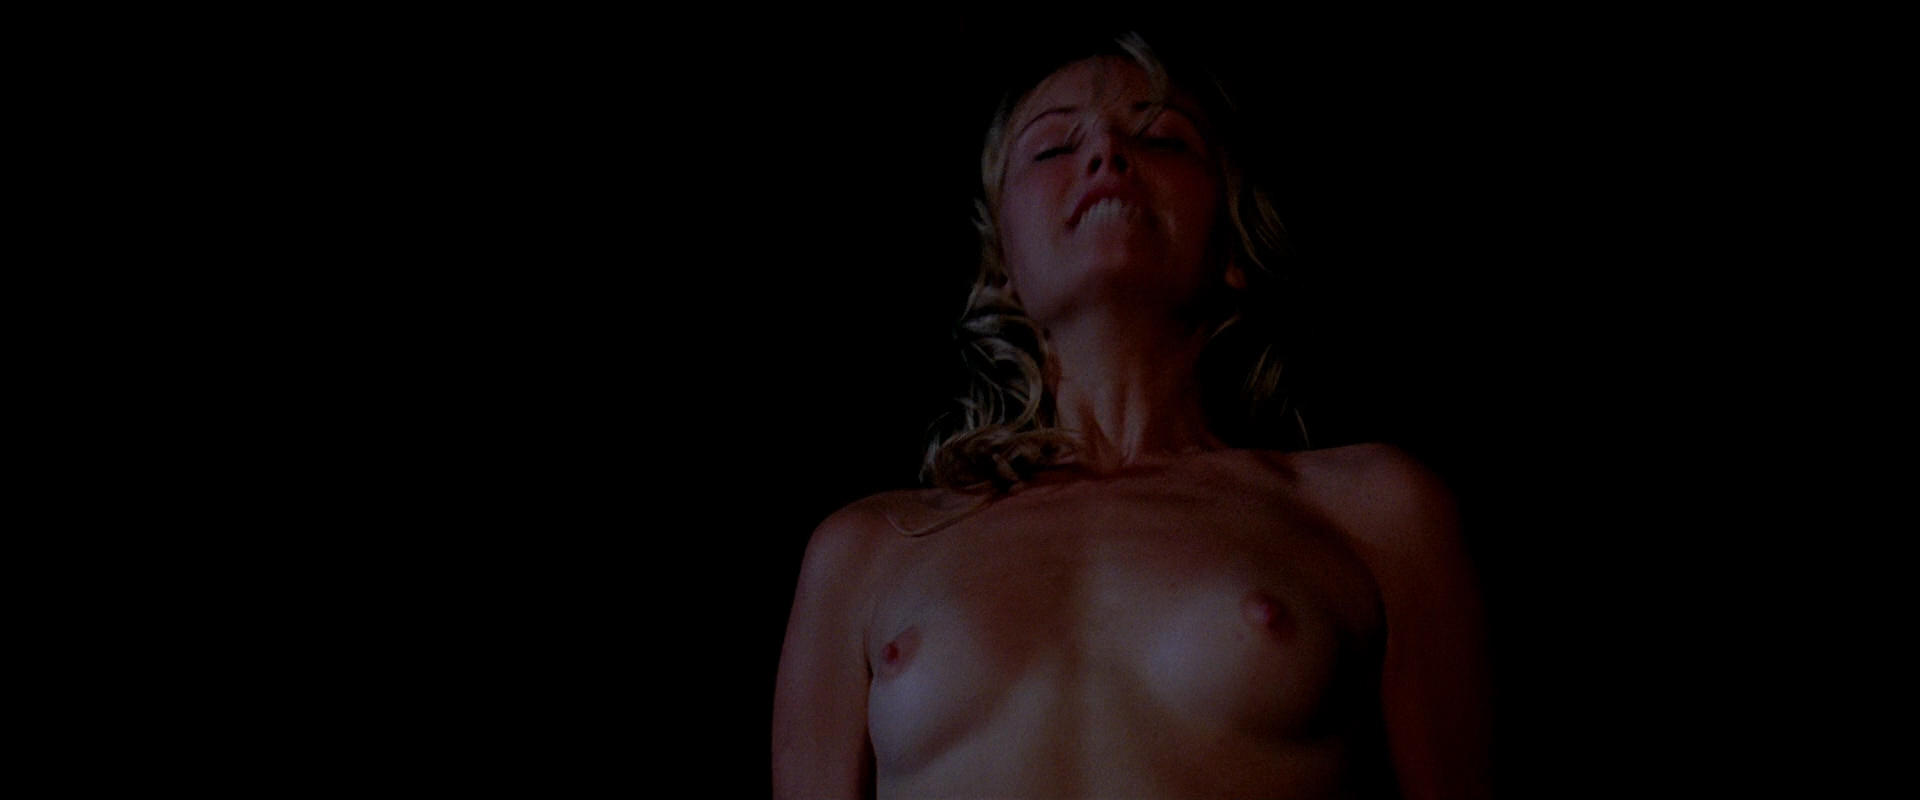 Malin Akerman Nude And Wild Sex And Kayla Kleevage Nude -4643